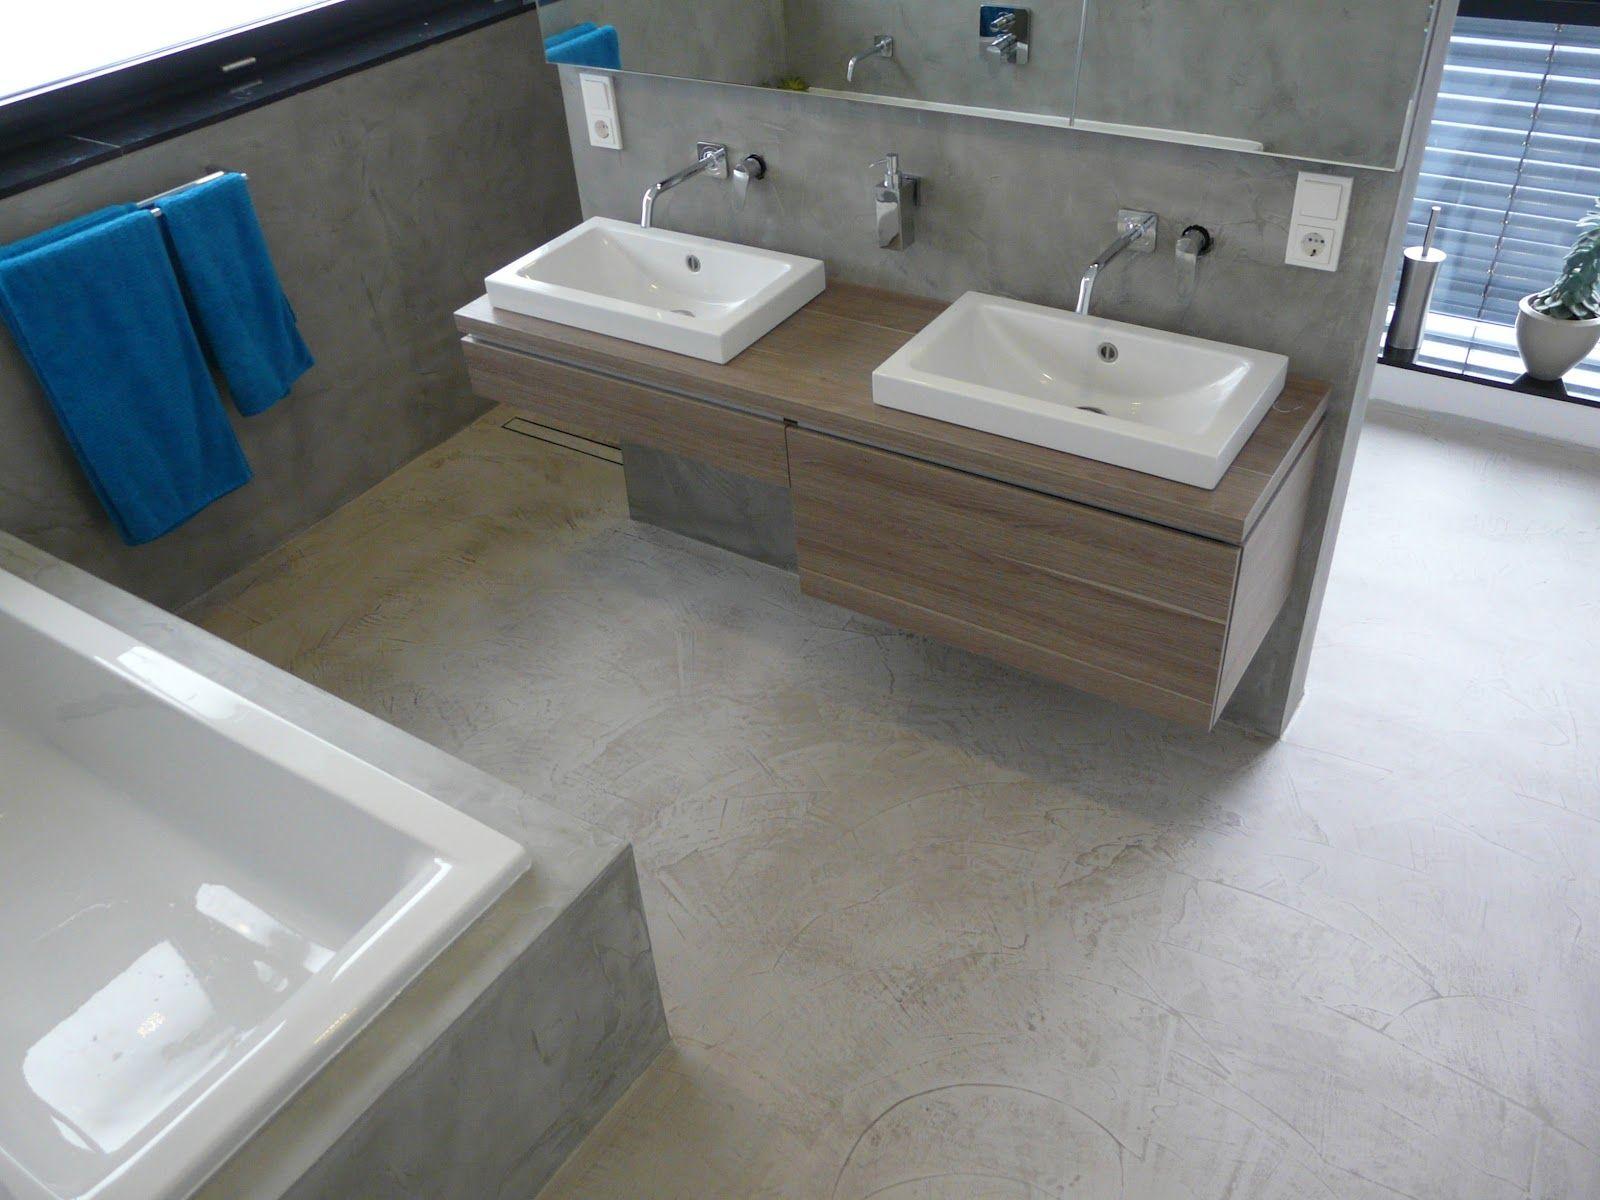 wand-wohndesign-beton-cire: beton floor - bodenbeschichtung in, Hause ideen